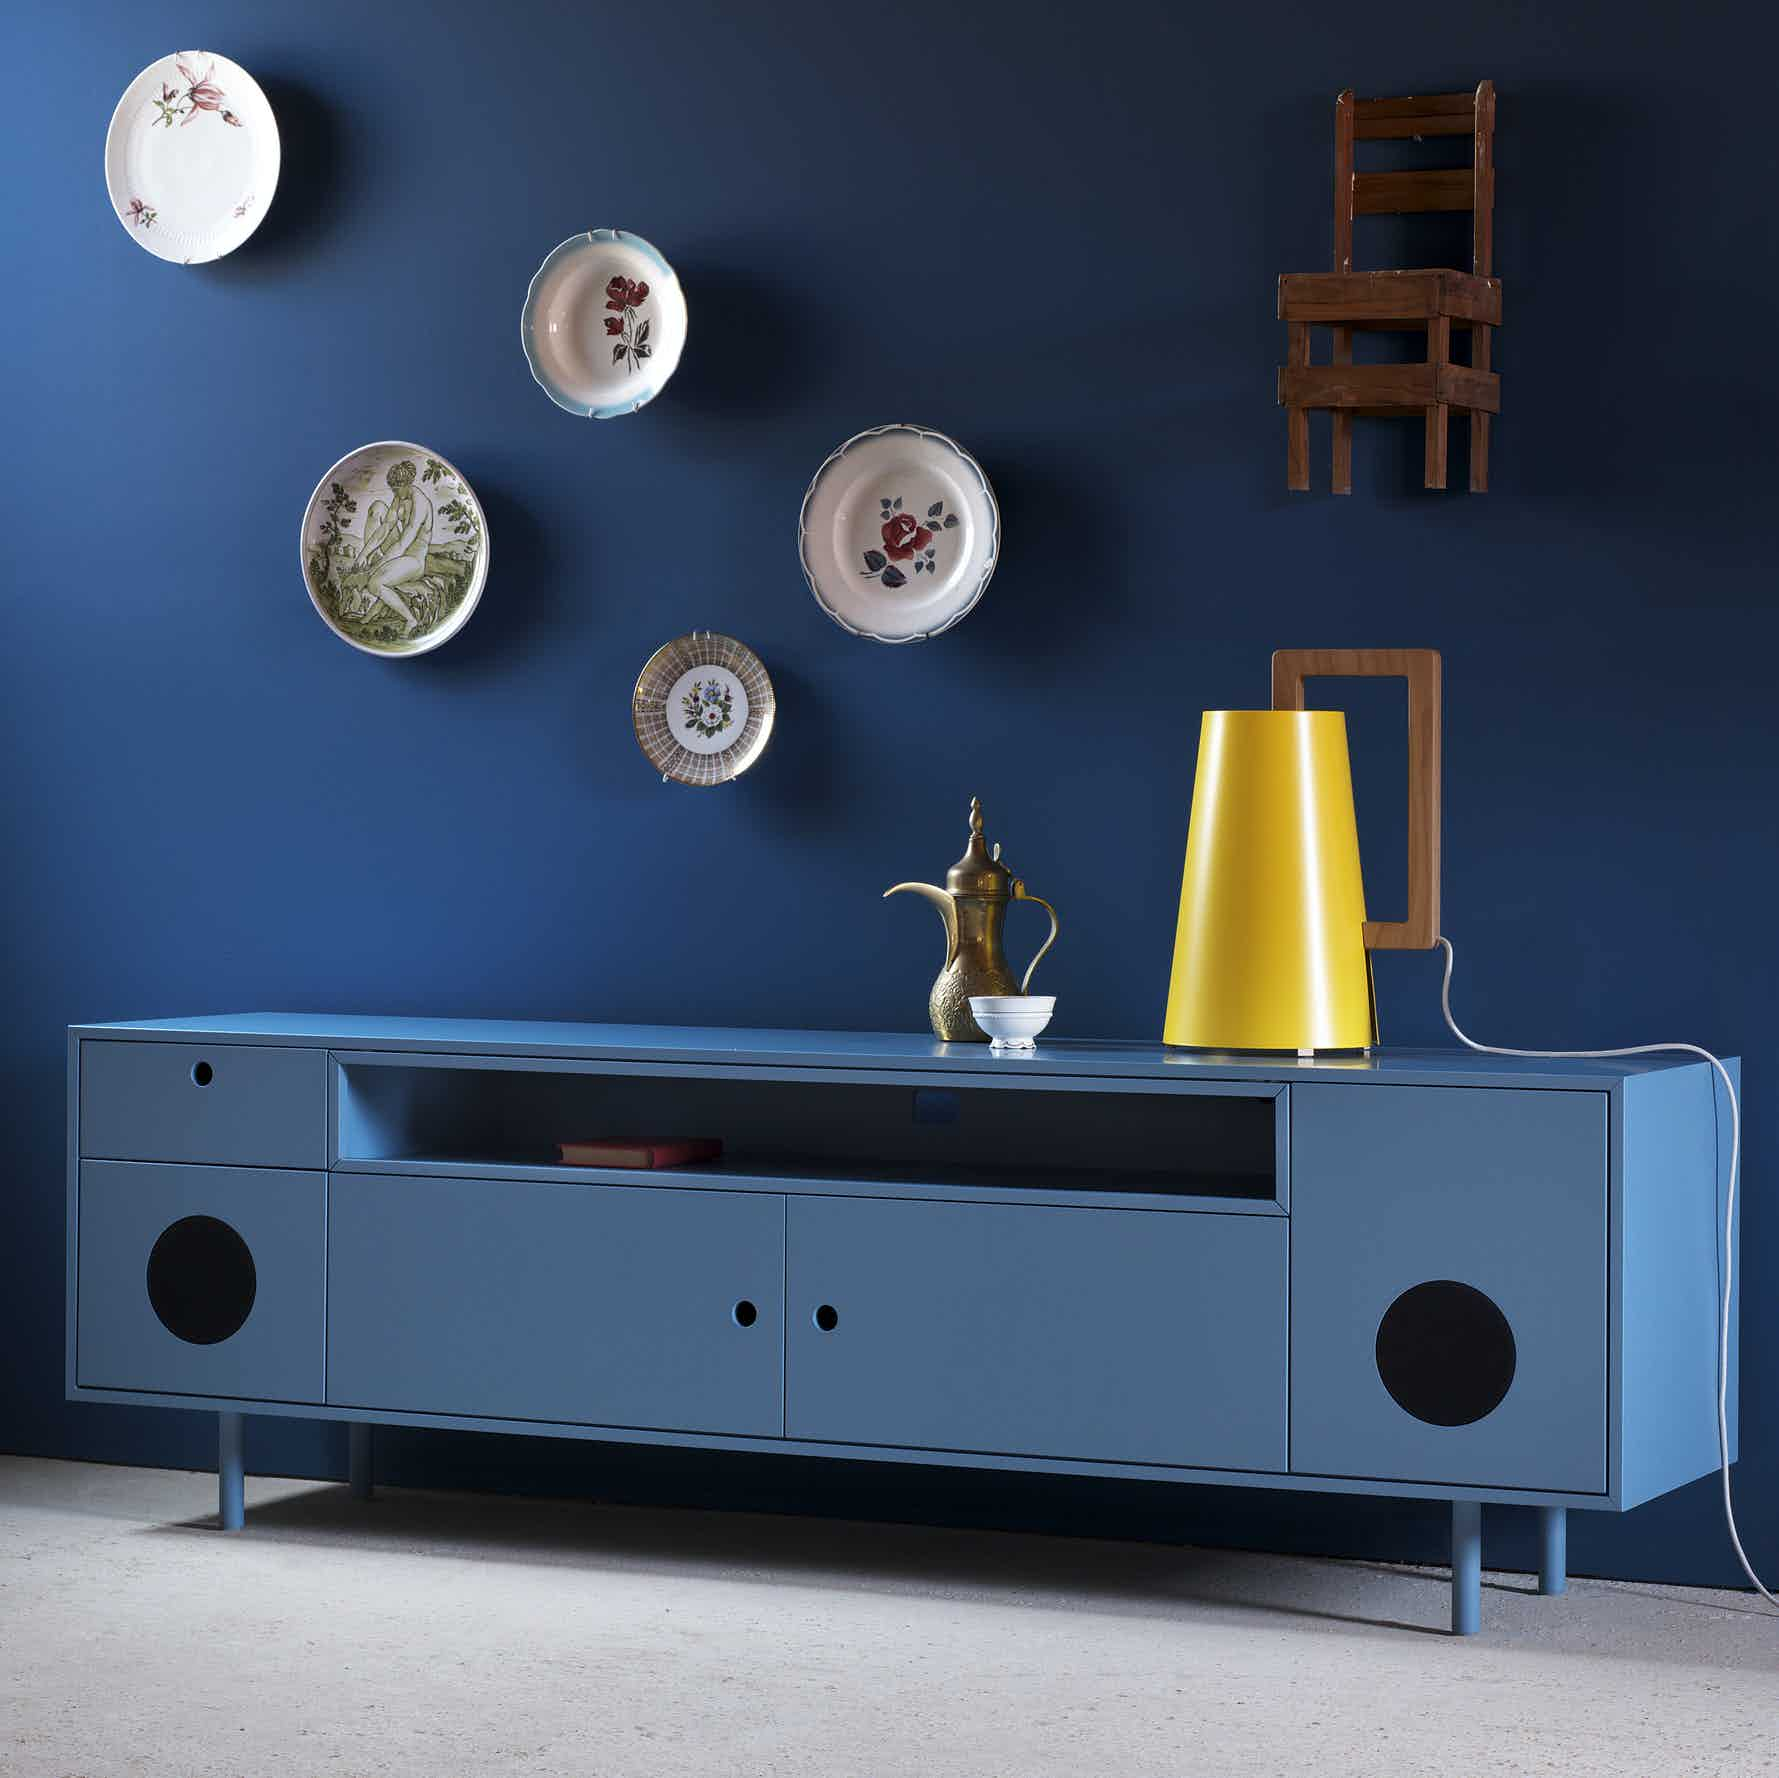 Miniforms Caixa Sideboard Blue Angle Haute Living